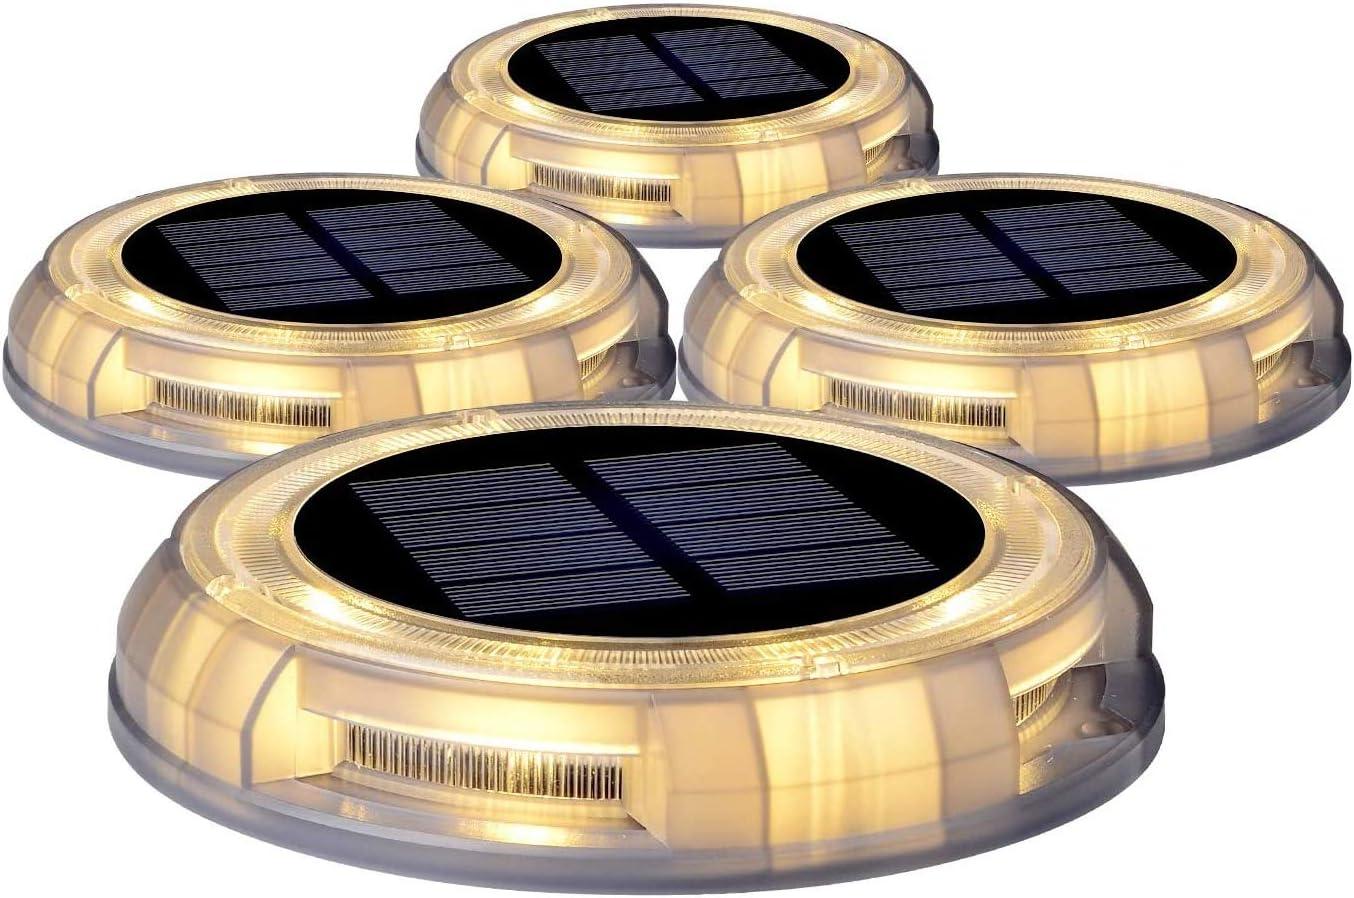 Solar Disk Lights, 4PACK Solar Dock Lights, Outdoor Waterproof Solar Ground Light for Lawns, Walkways, Courtyards, Decks, Terraces, Pathway, Stairs